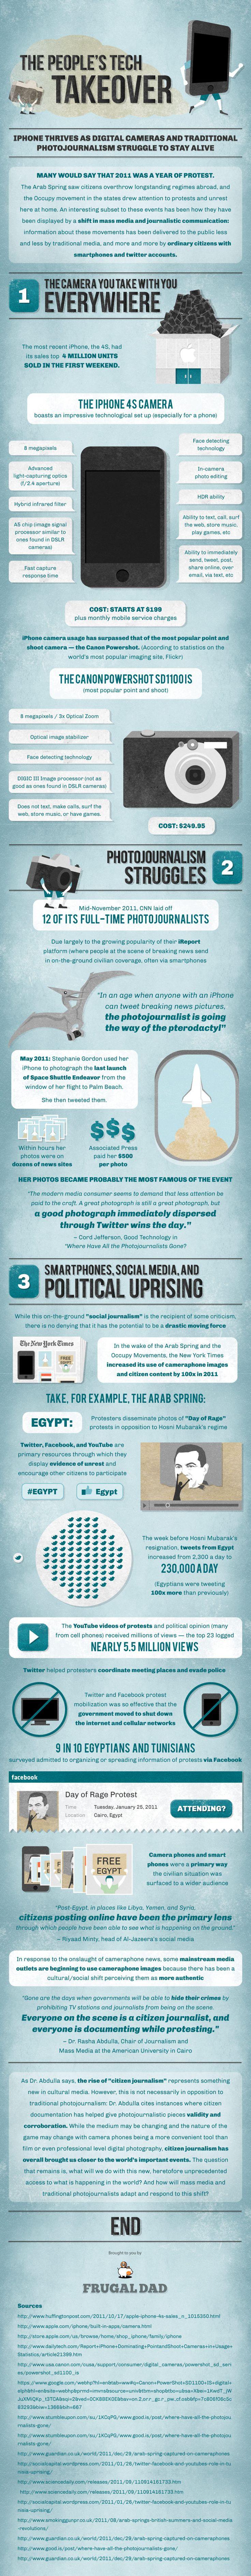 Citizen Journalism through Technology